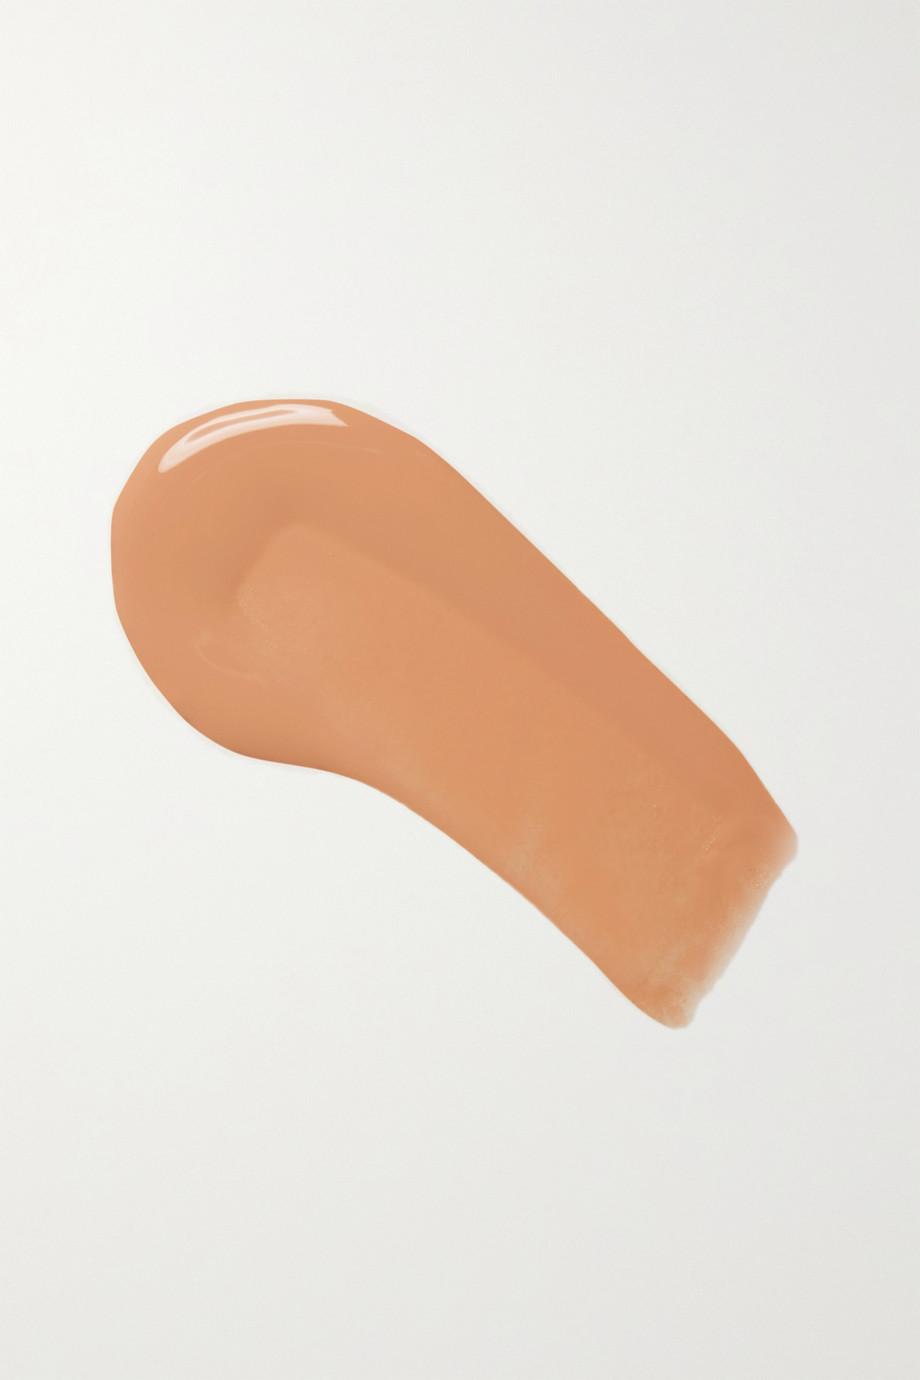 Bobbi Brown Skin Long-Wear Fluid Powder Foundation SPF20 - Natural Tan